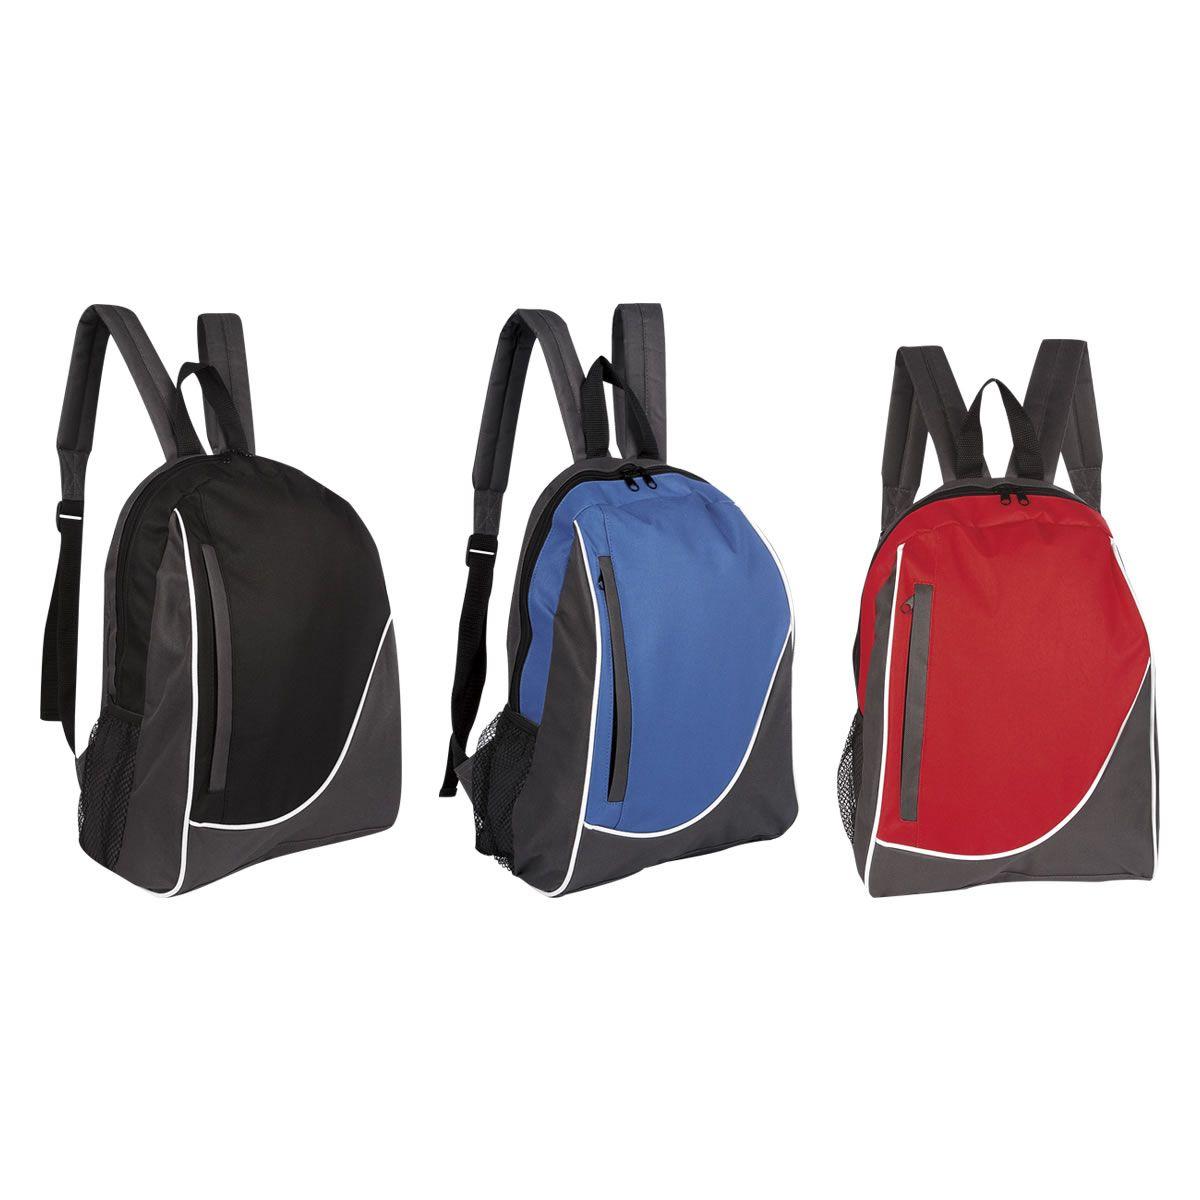 Mochila escolar backpack AP-337